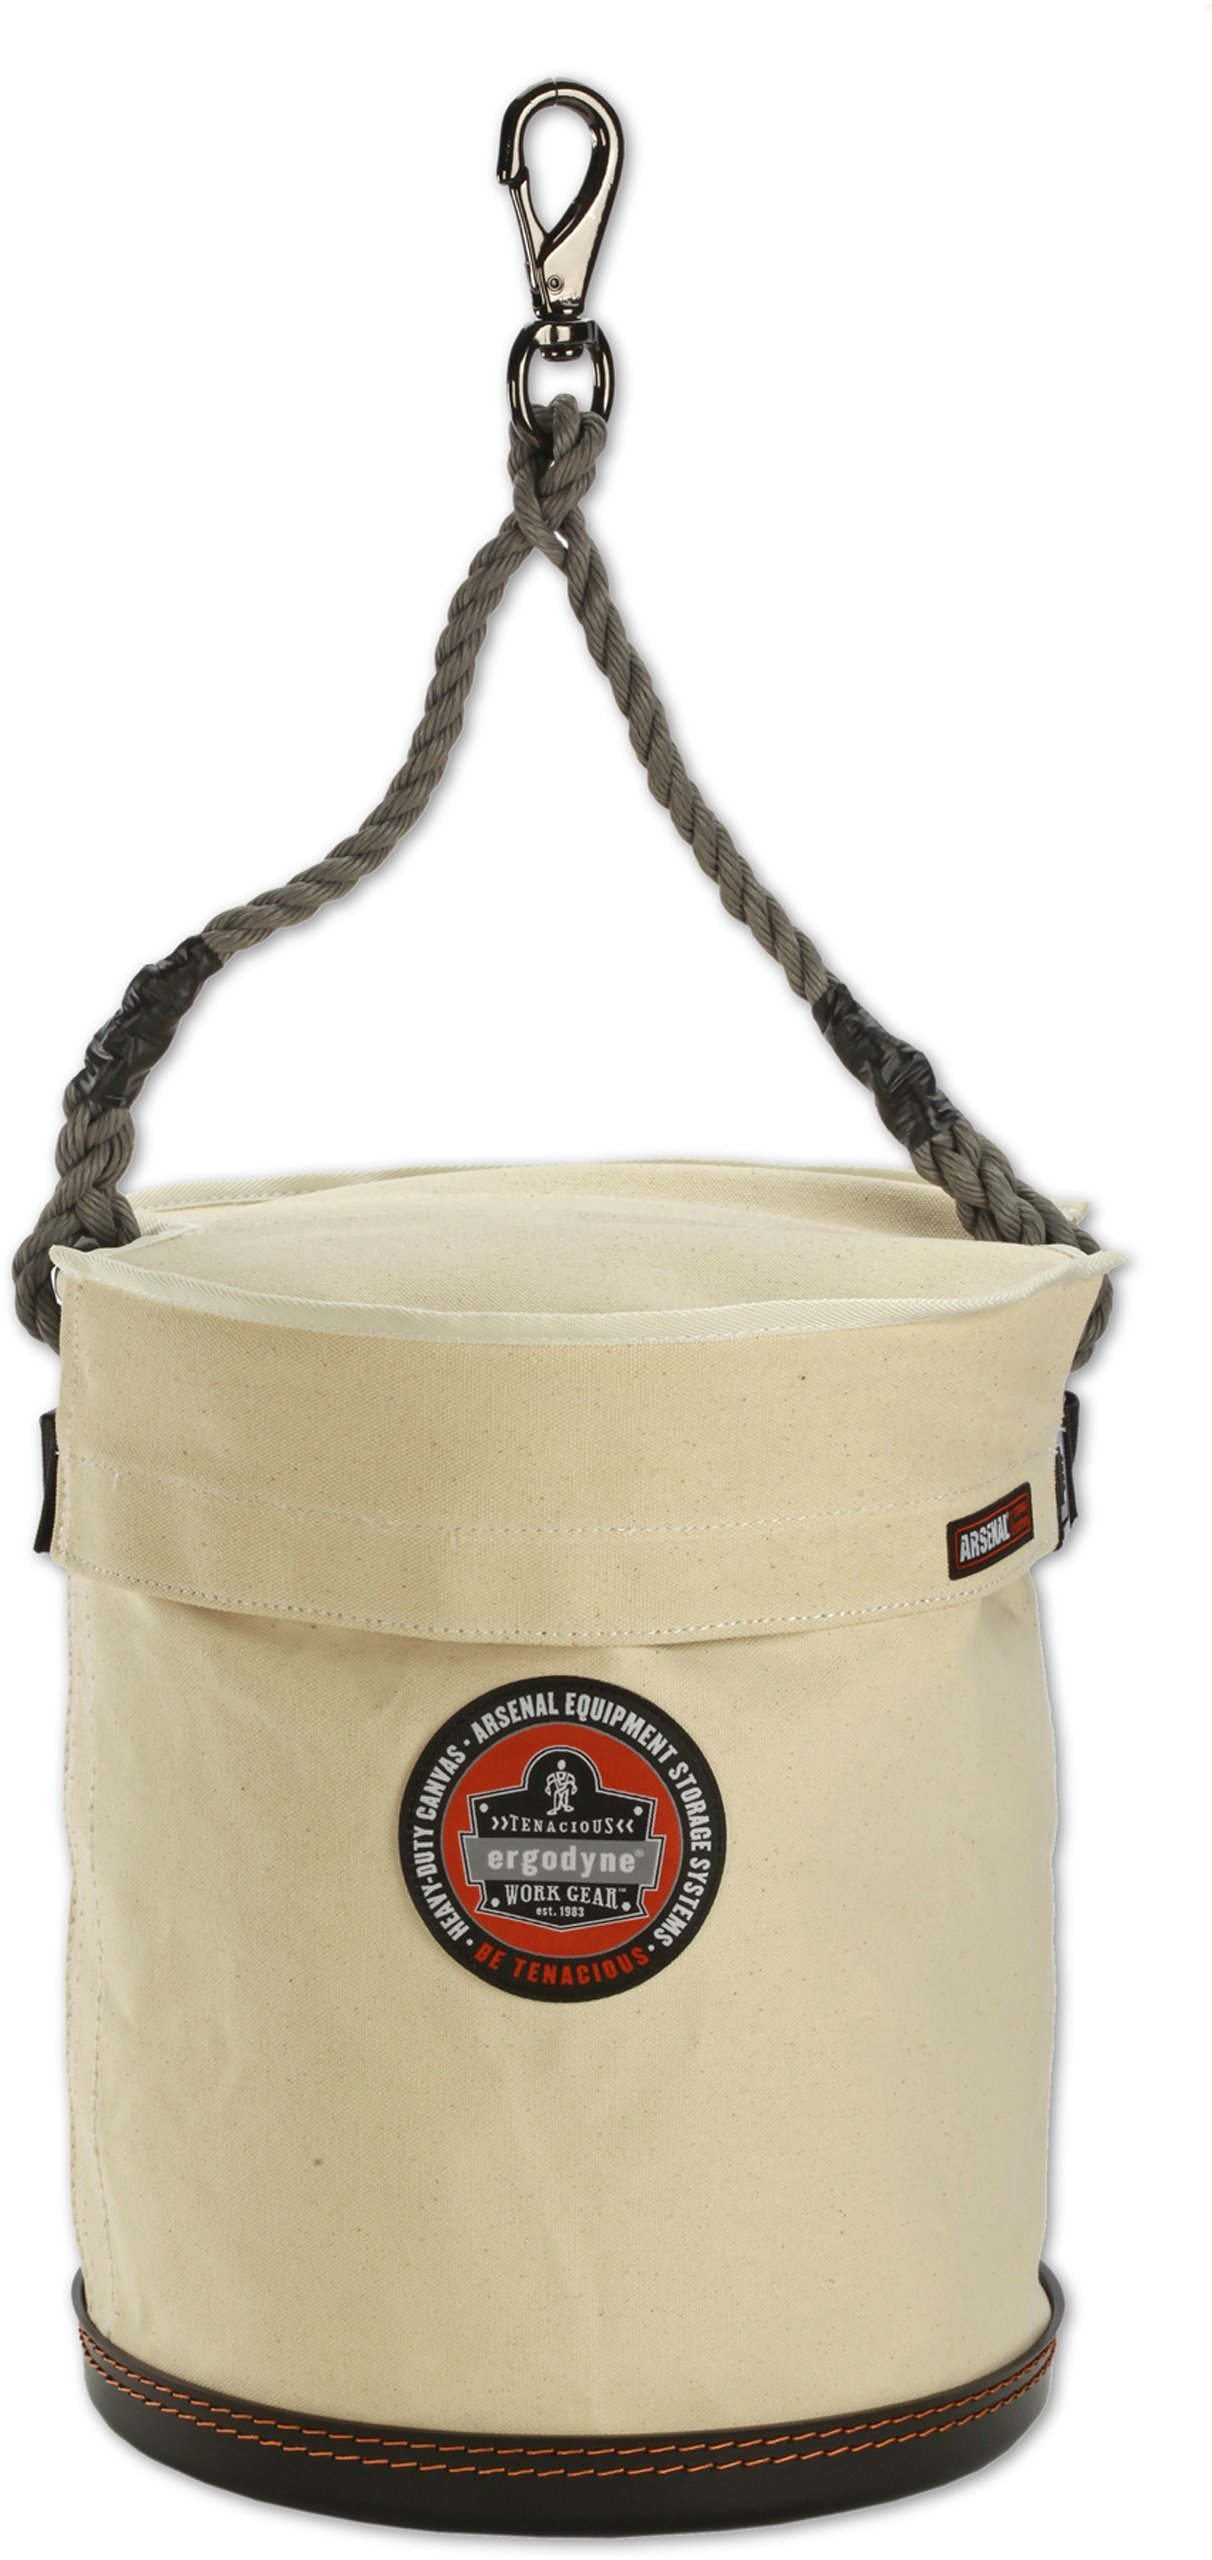 Ergodyne Arsenal 5743T Plastic Bottom Tool Bucket with Cover, 12.5'', 15''H